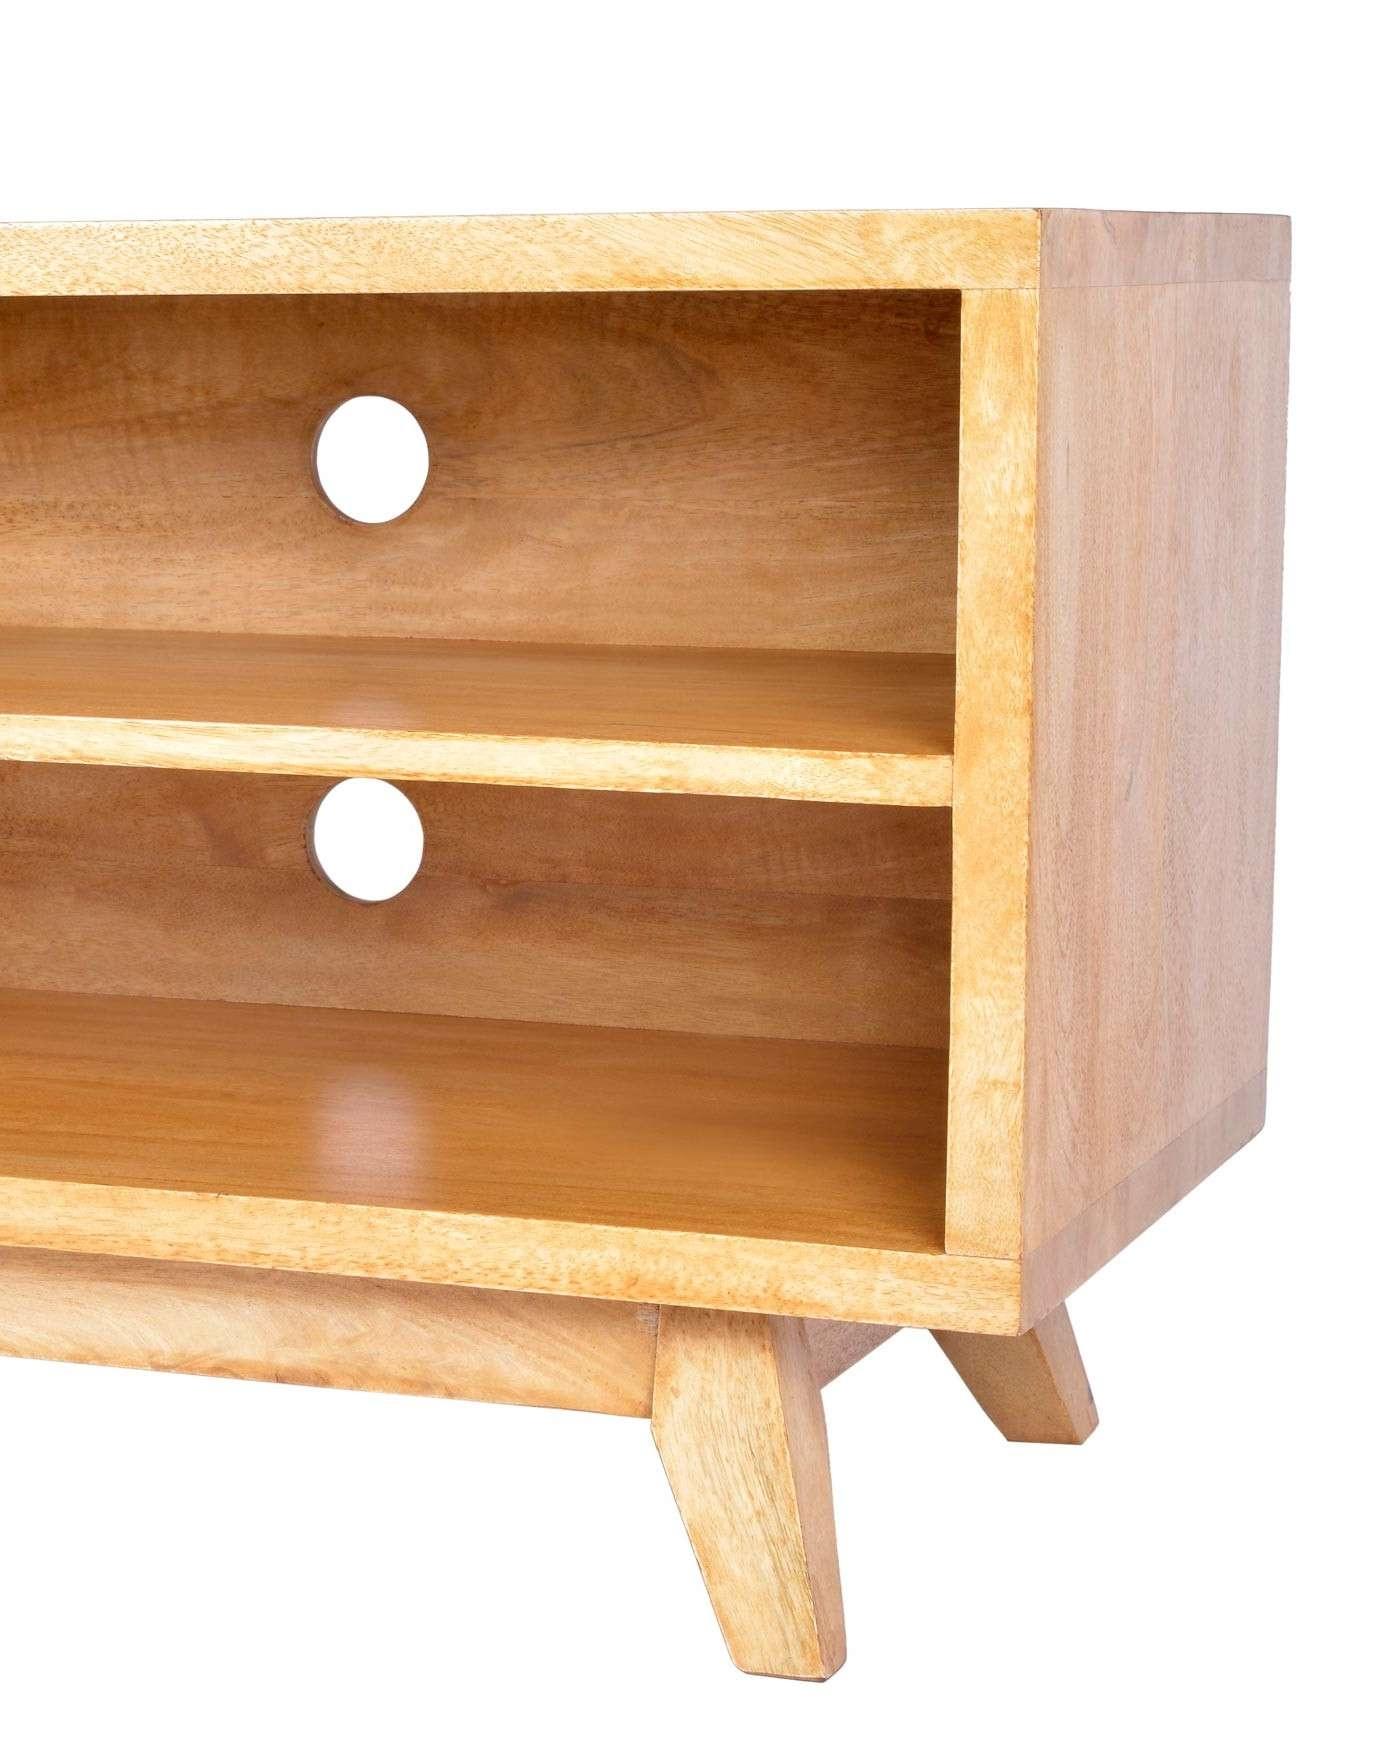 Tv : Mango Wood Tv Stands Gratifying Dark Mango Wood Tv Stand Pertaining To Mango Wood Tv Cabinets (View 20 of 20)